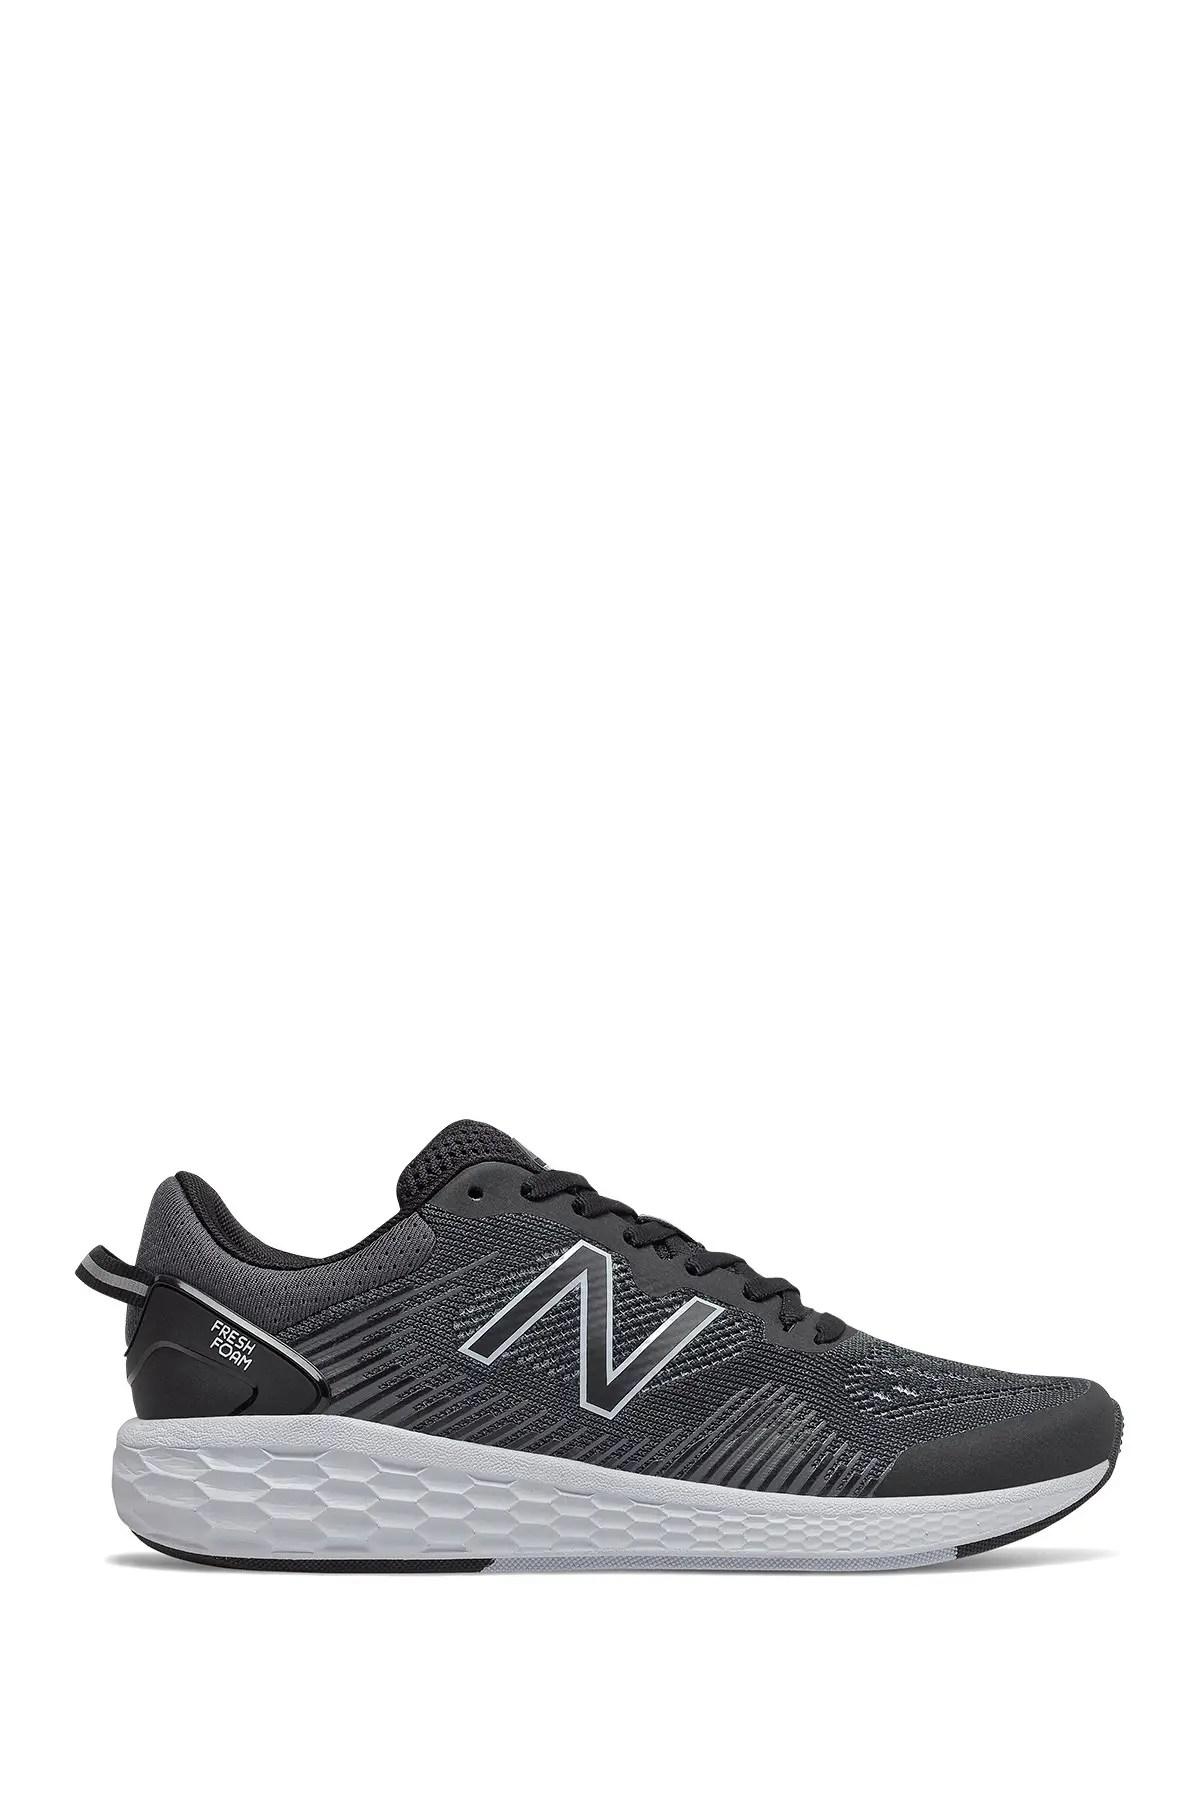 tennis shoes for women nordstrom rack